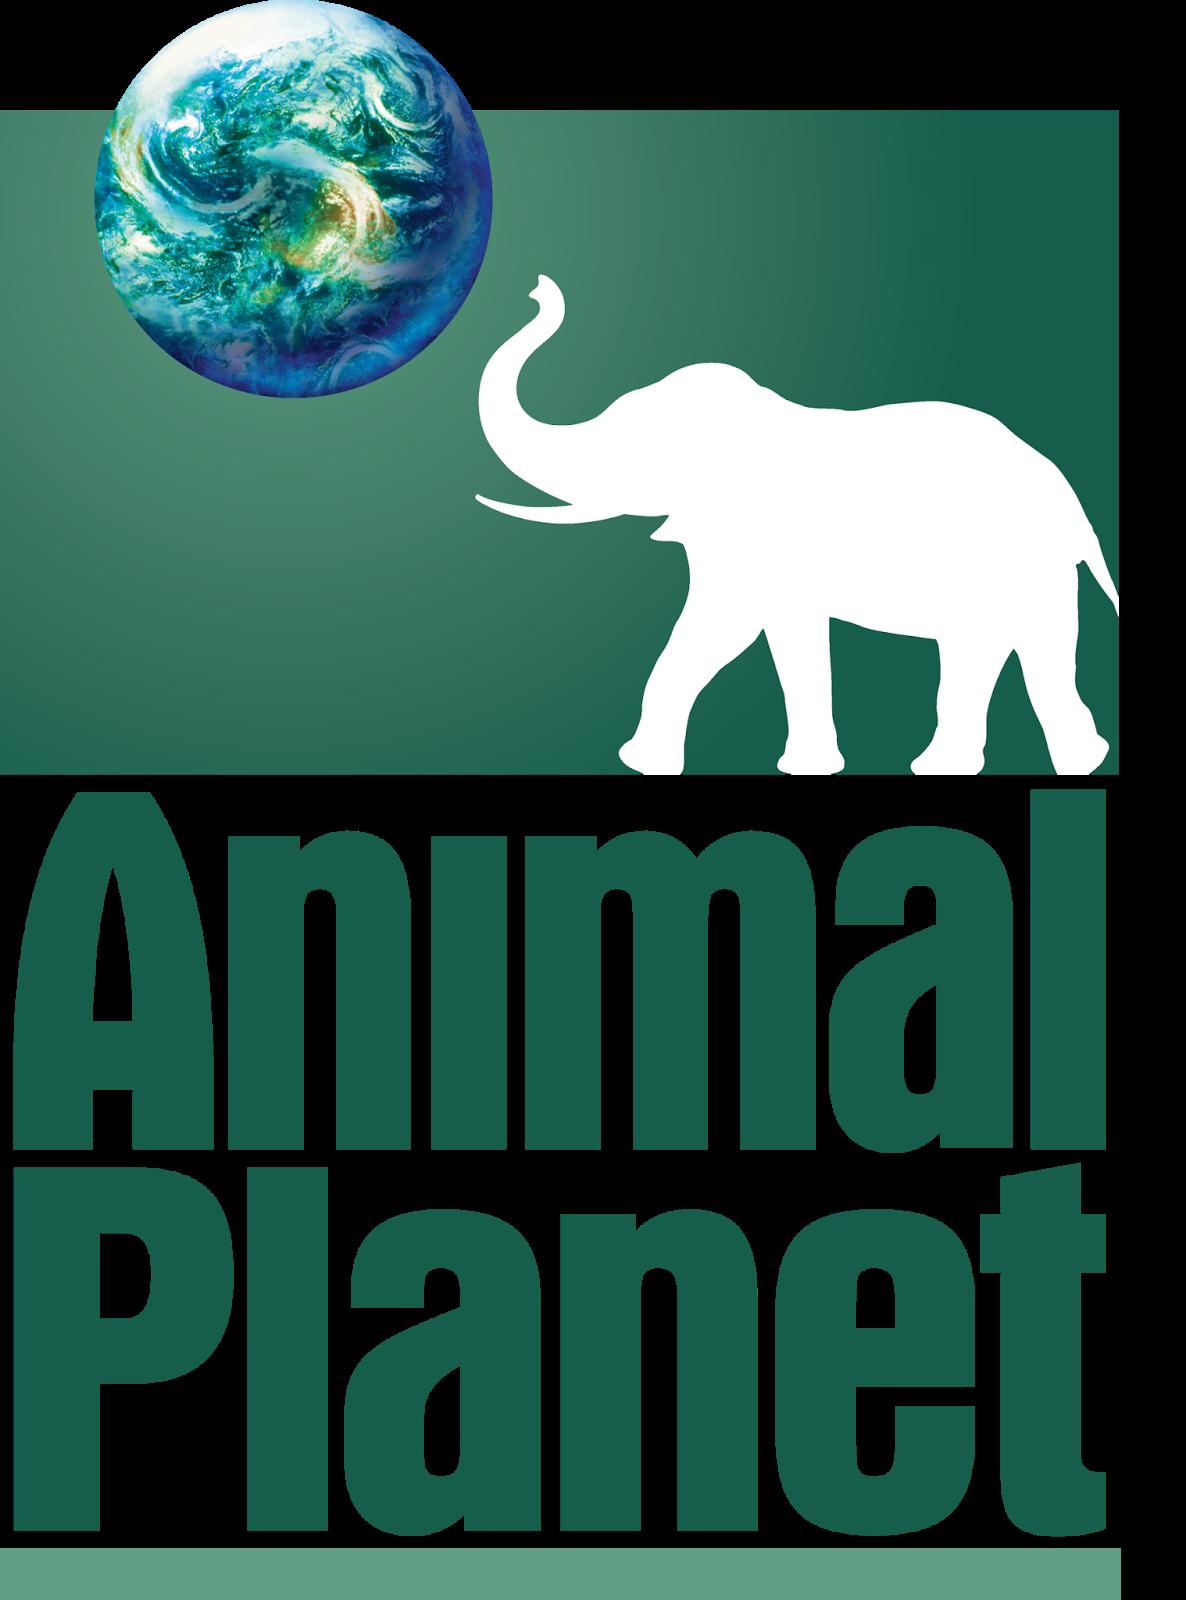 Animal planet cambio de logo todo marketing for Pool show animal planet